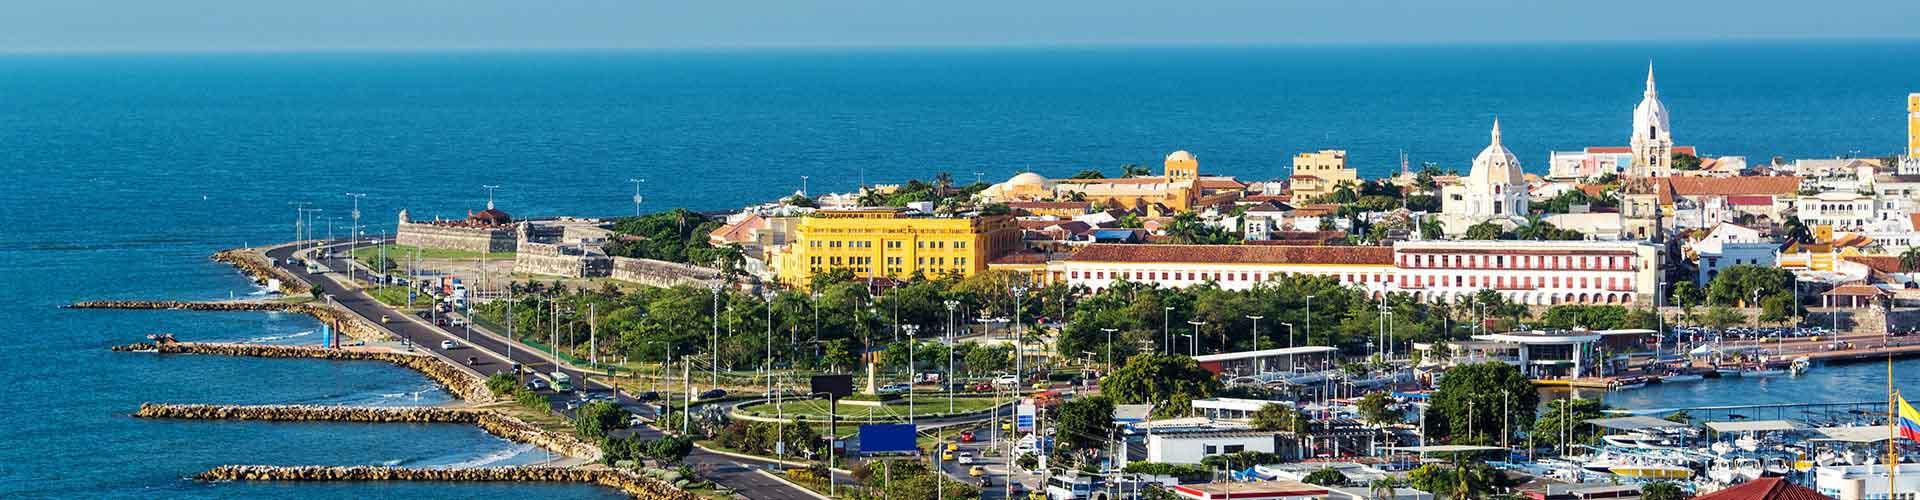 Cartagena – Ostelli a Cartagena. Mappe per Cartagena, Foto e  Recensioni per ogni Ostello a Cartagena.